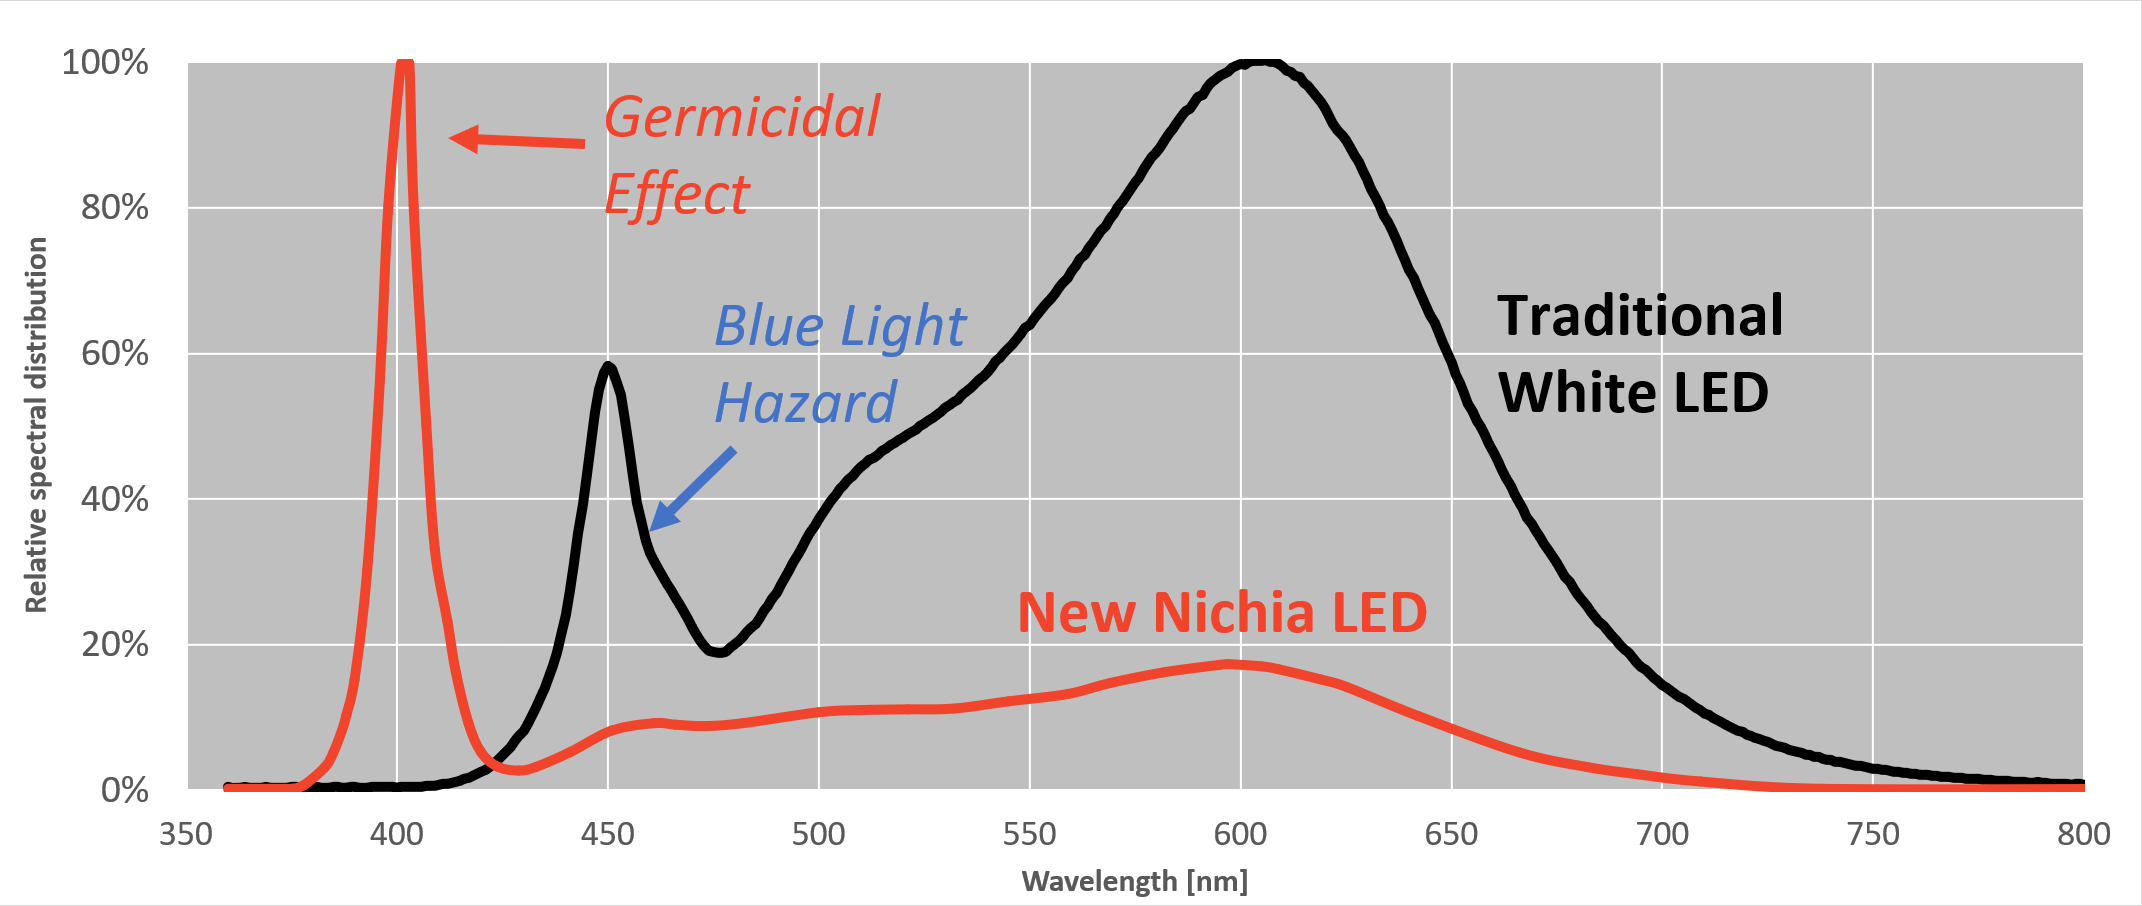 Nichia LED - germicidal violet